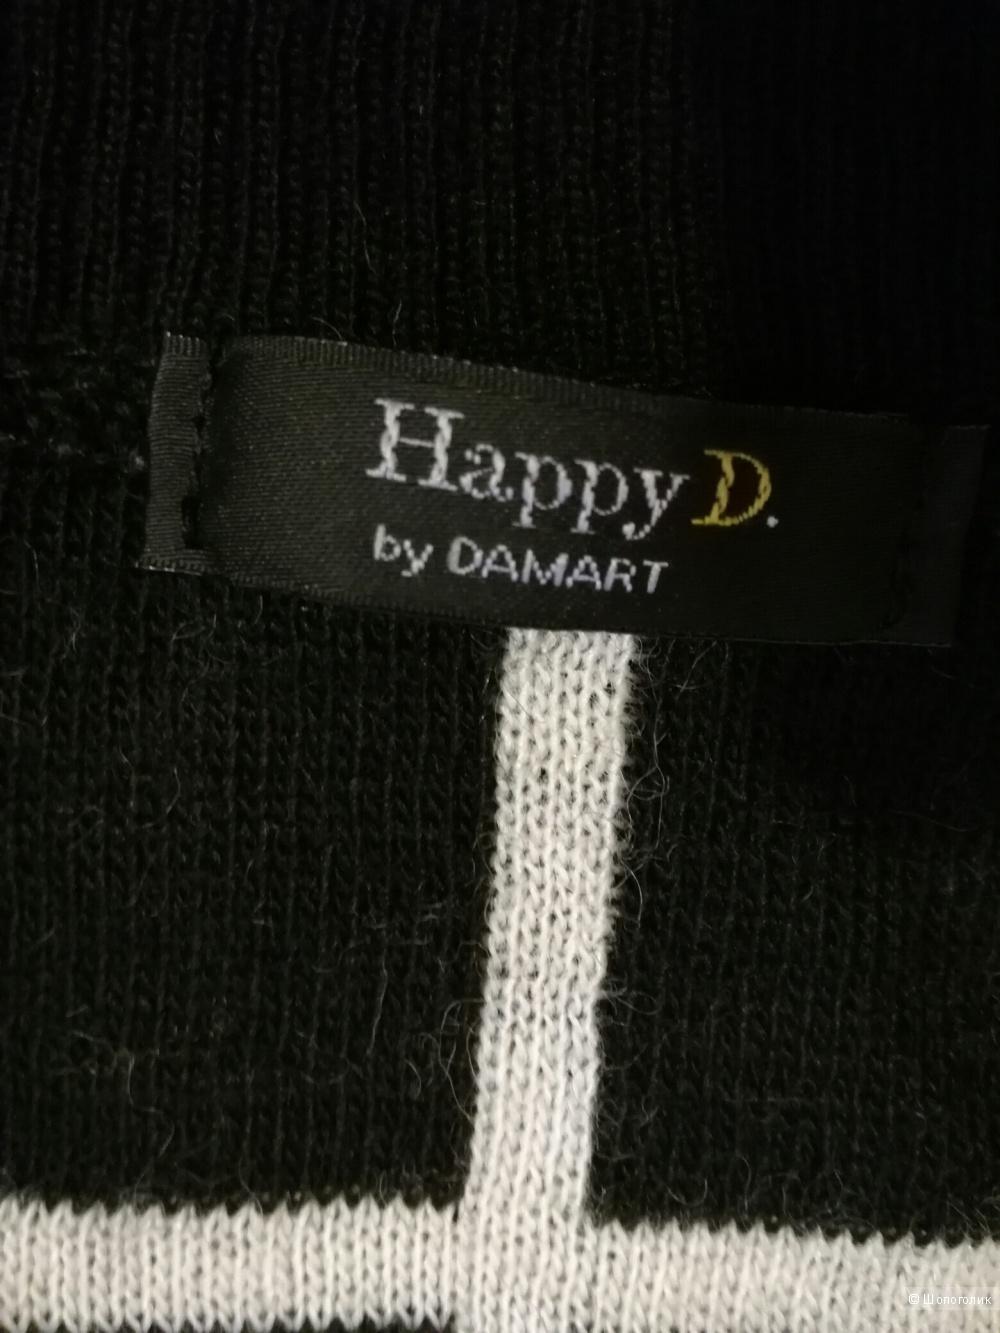 Водолазка-джемпер Happy D by Damart 44-46 р.